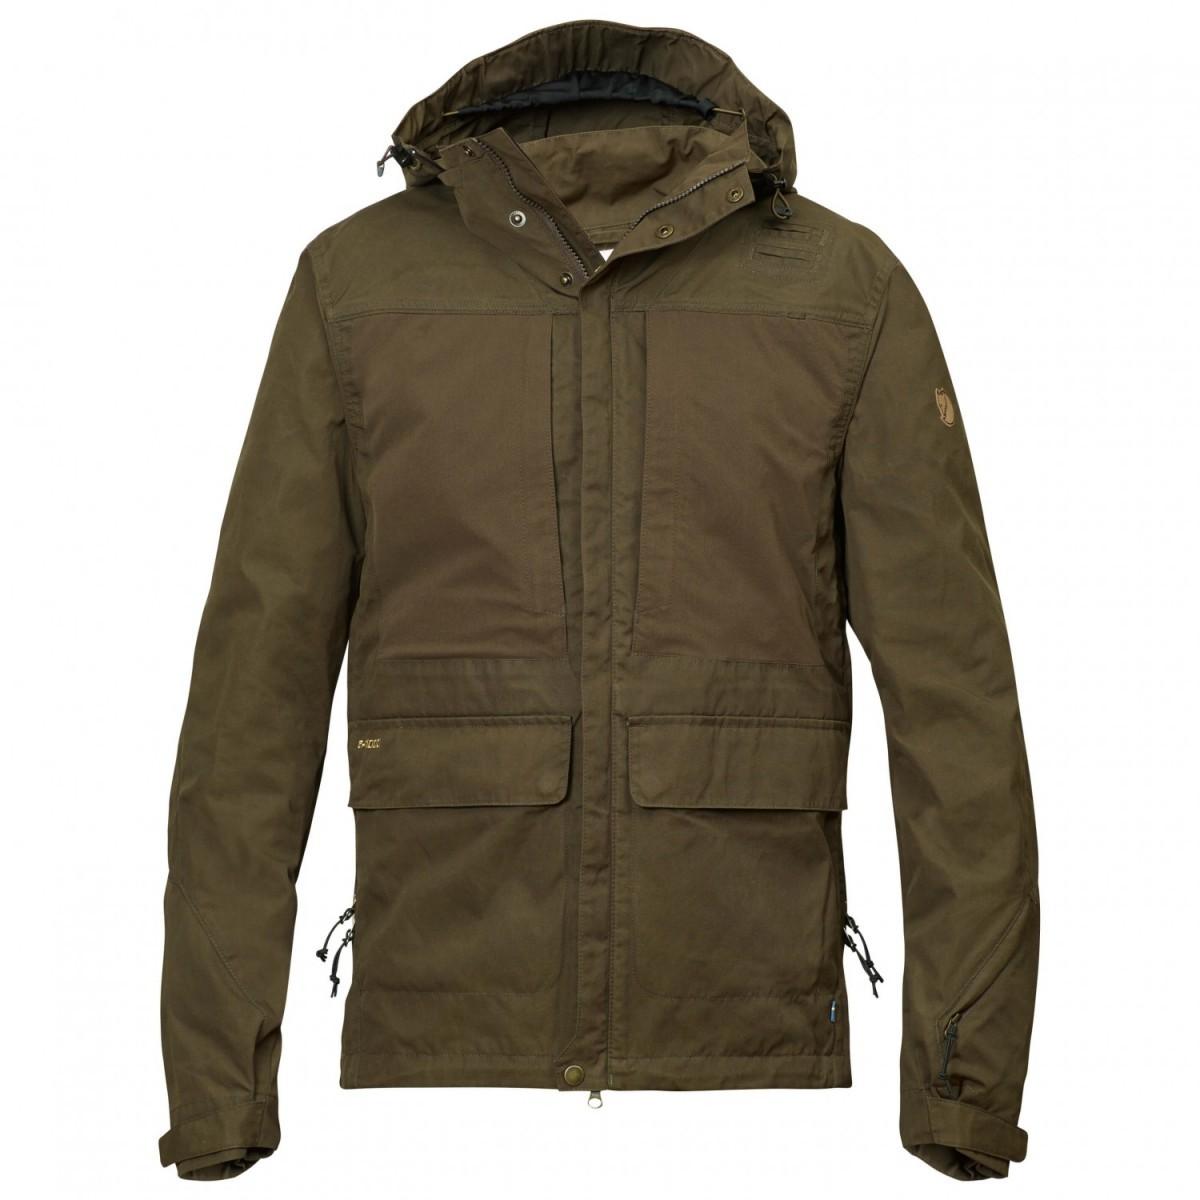 FJALLRAVEN フェールラーベン Lappland Hybrid Jacket ジャケット (Dark Olive)